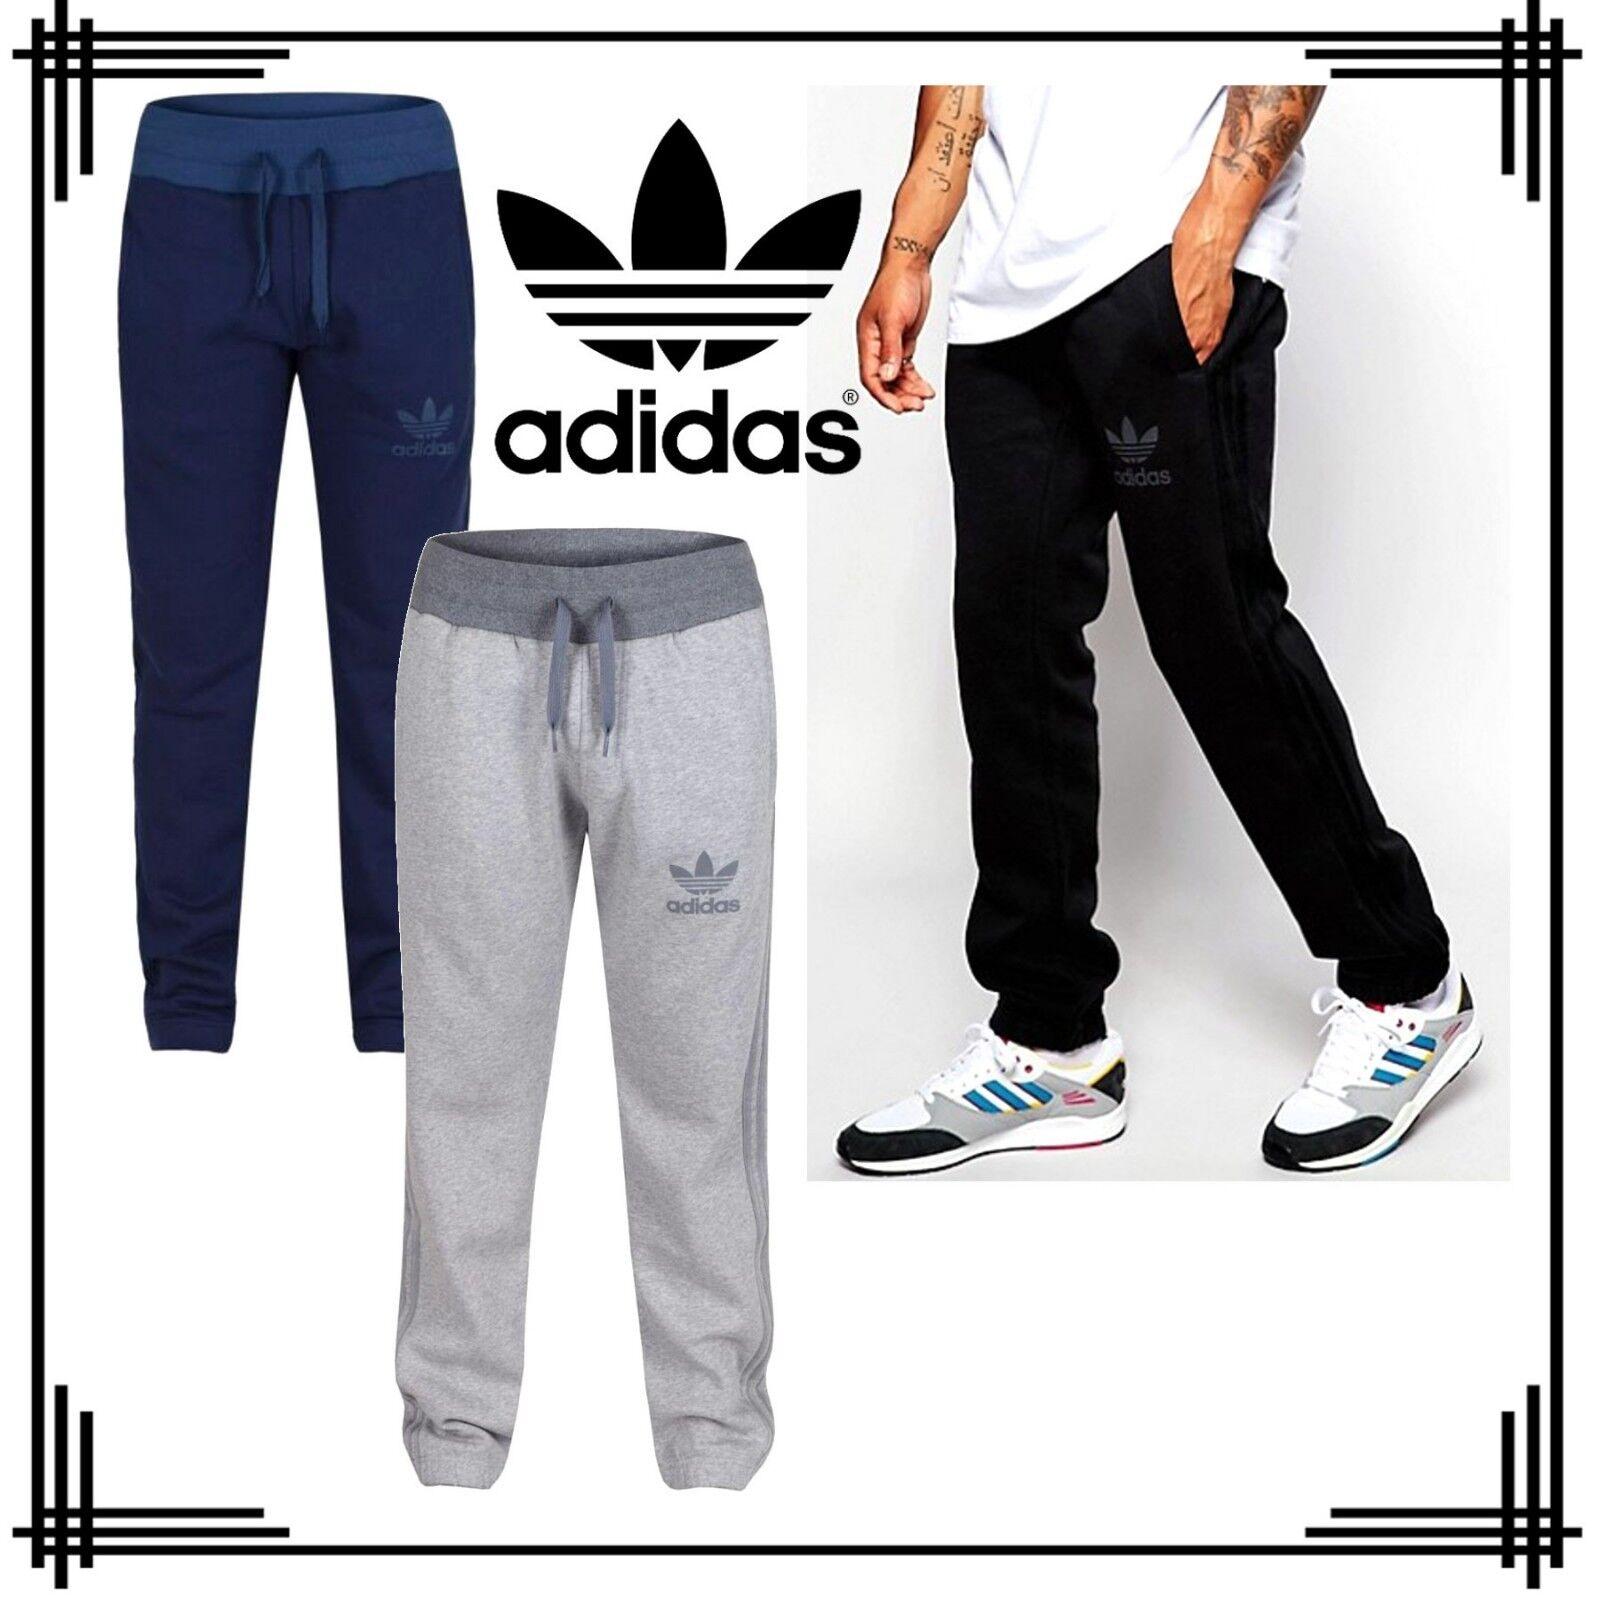 4c2da07b273c adidas Originals SPO Trefoil Sweatpants Mens Tracksuit Trousers Black Grey  Navy